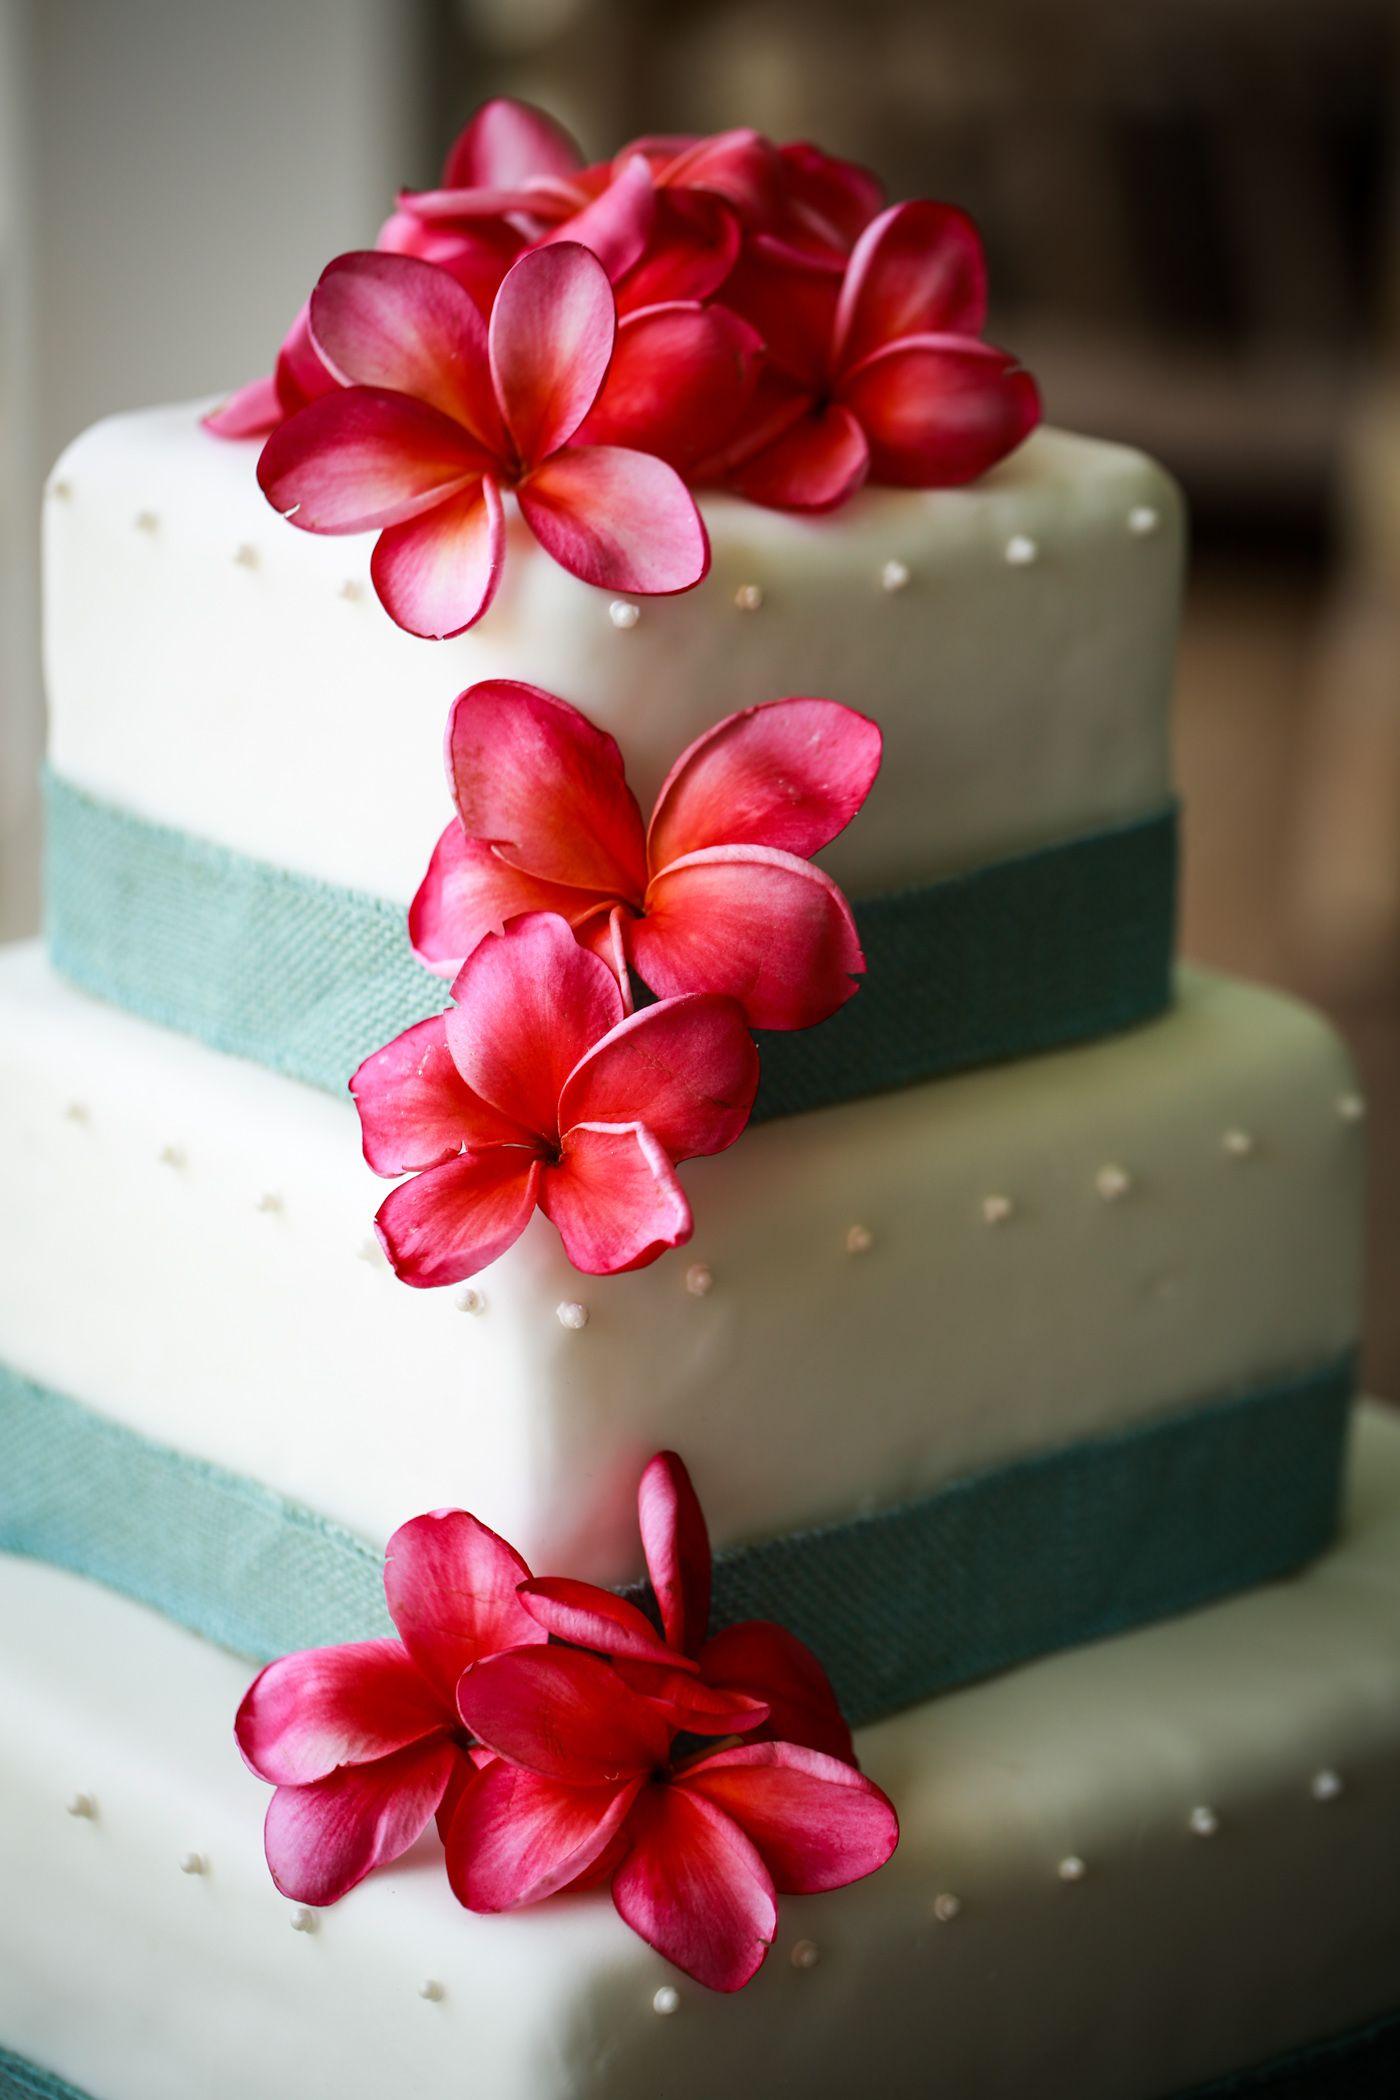 maui wedding cake with fresh plumeria flowers